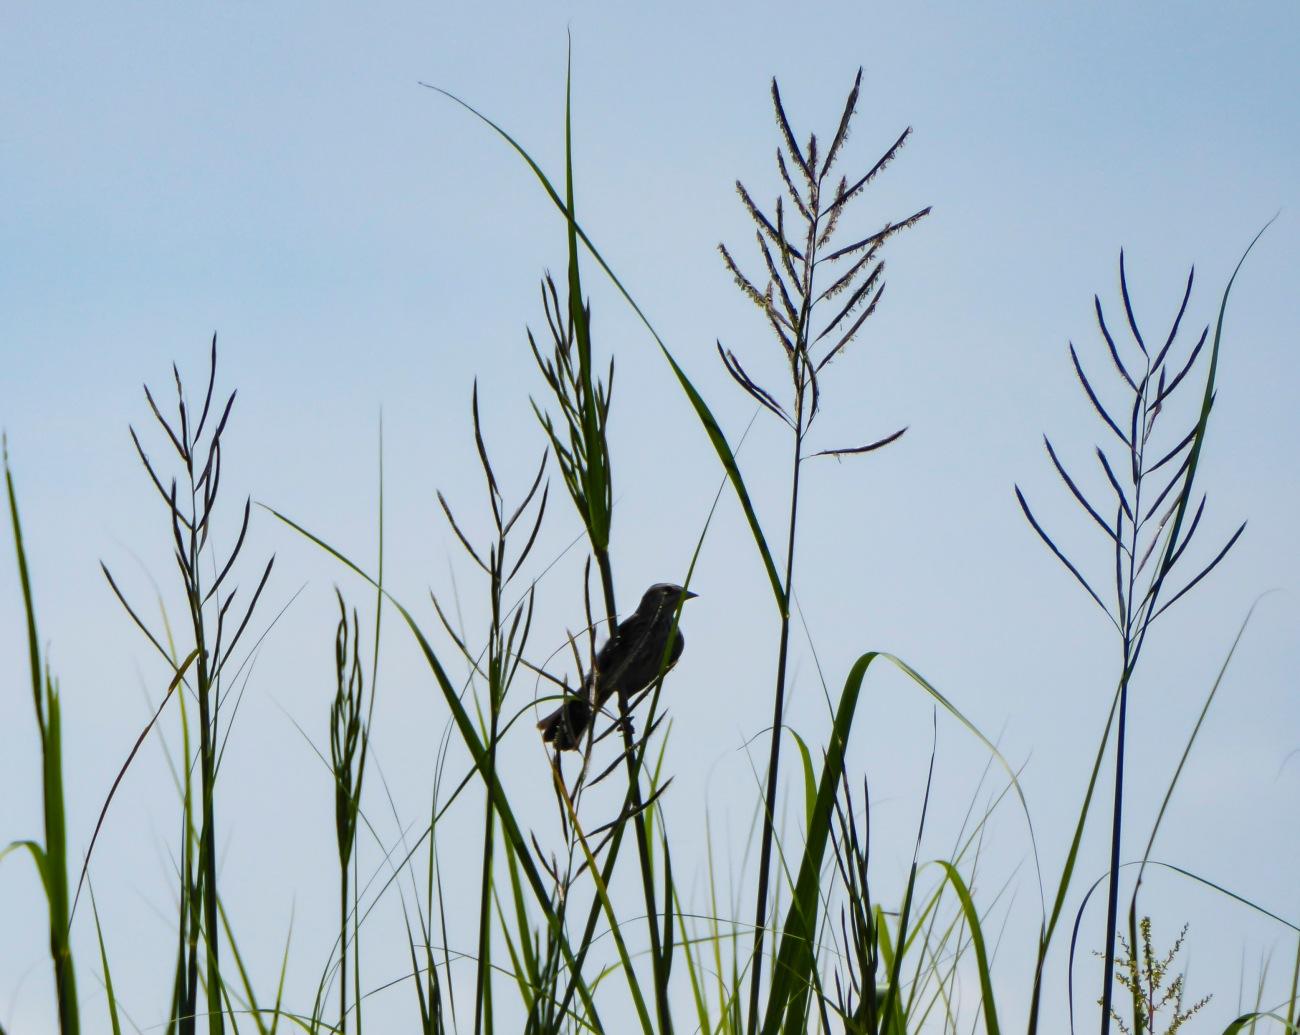 20180729_125522_Songbird in the marsh grass